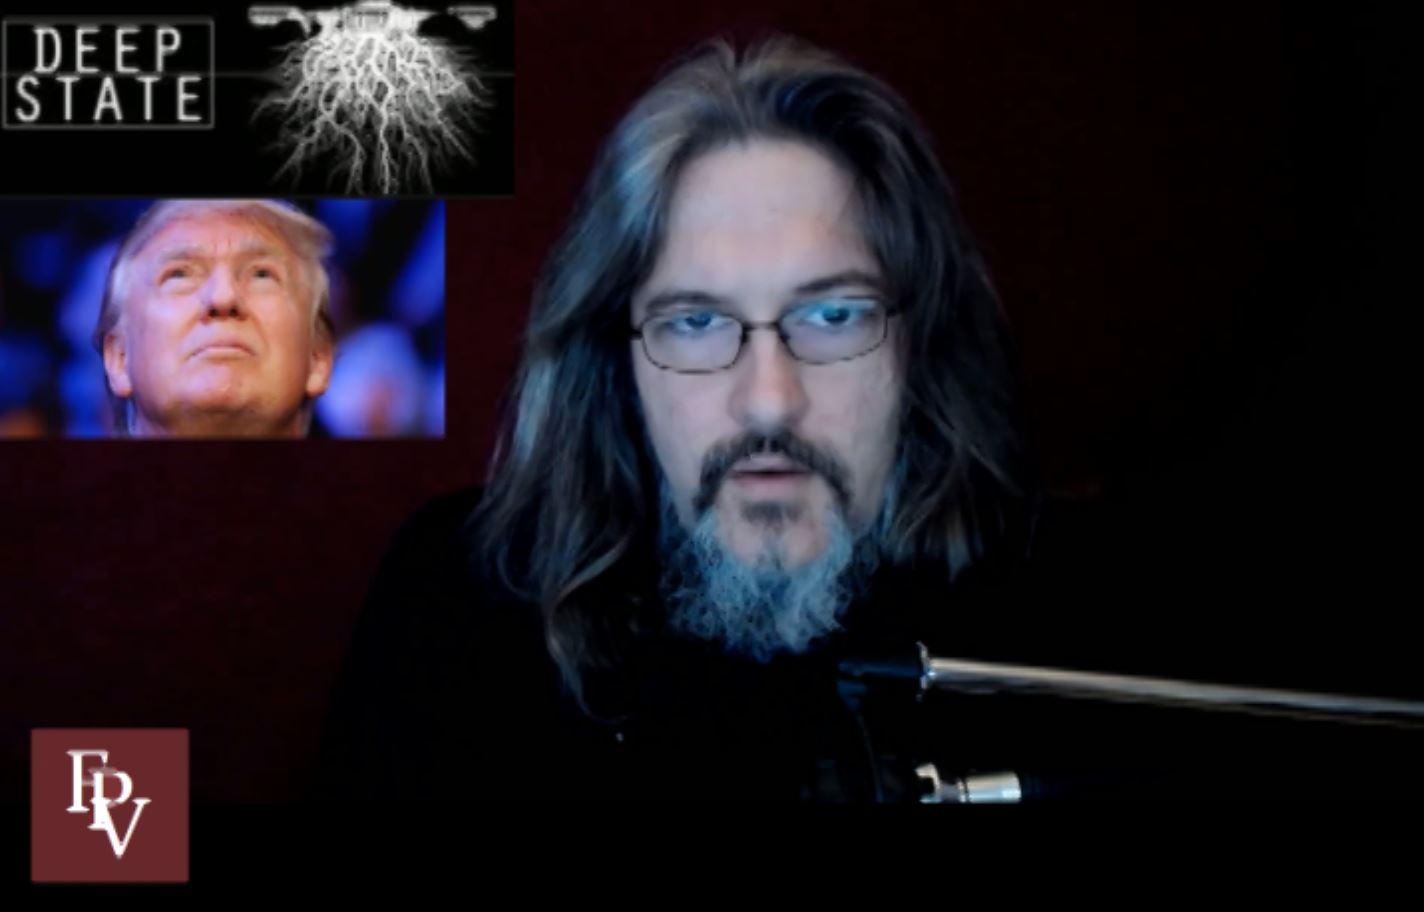 VIDEO BROADCAST: 01.17.17 – The Trump Inauguration